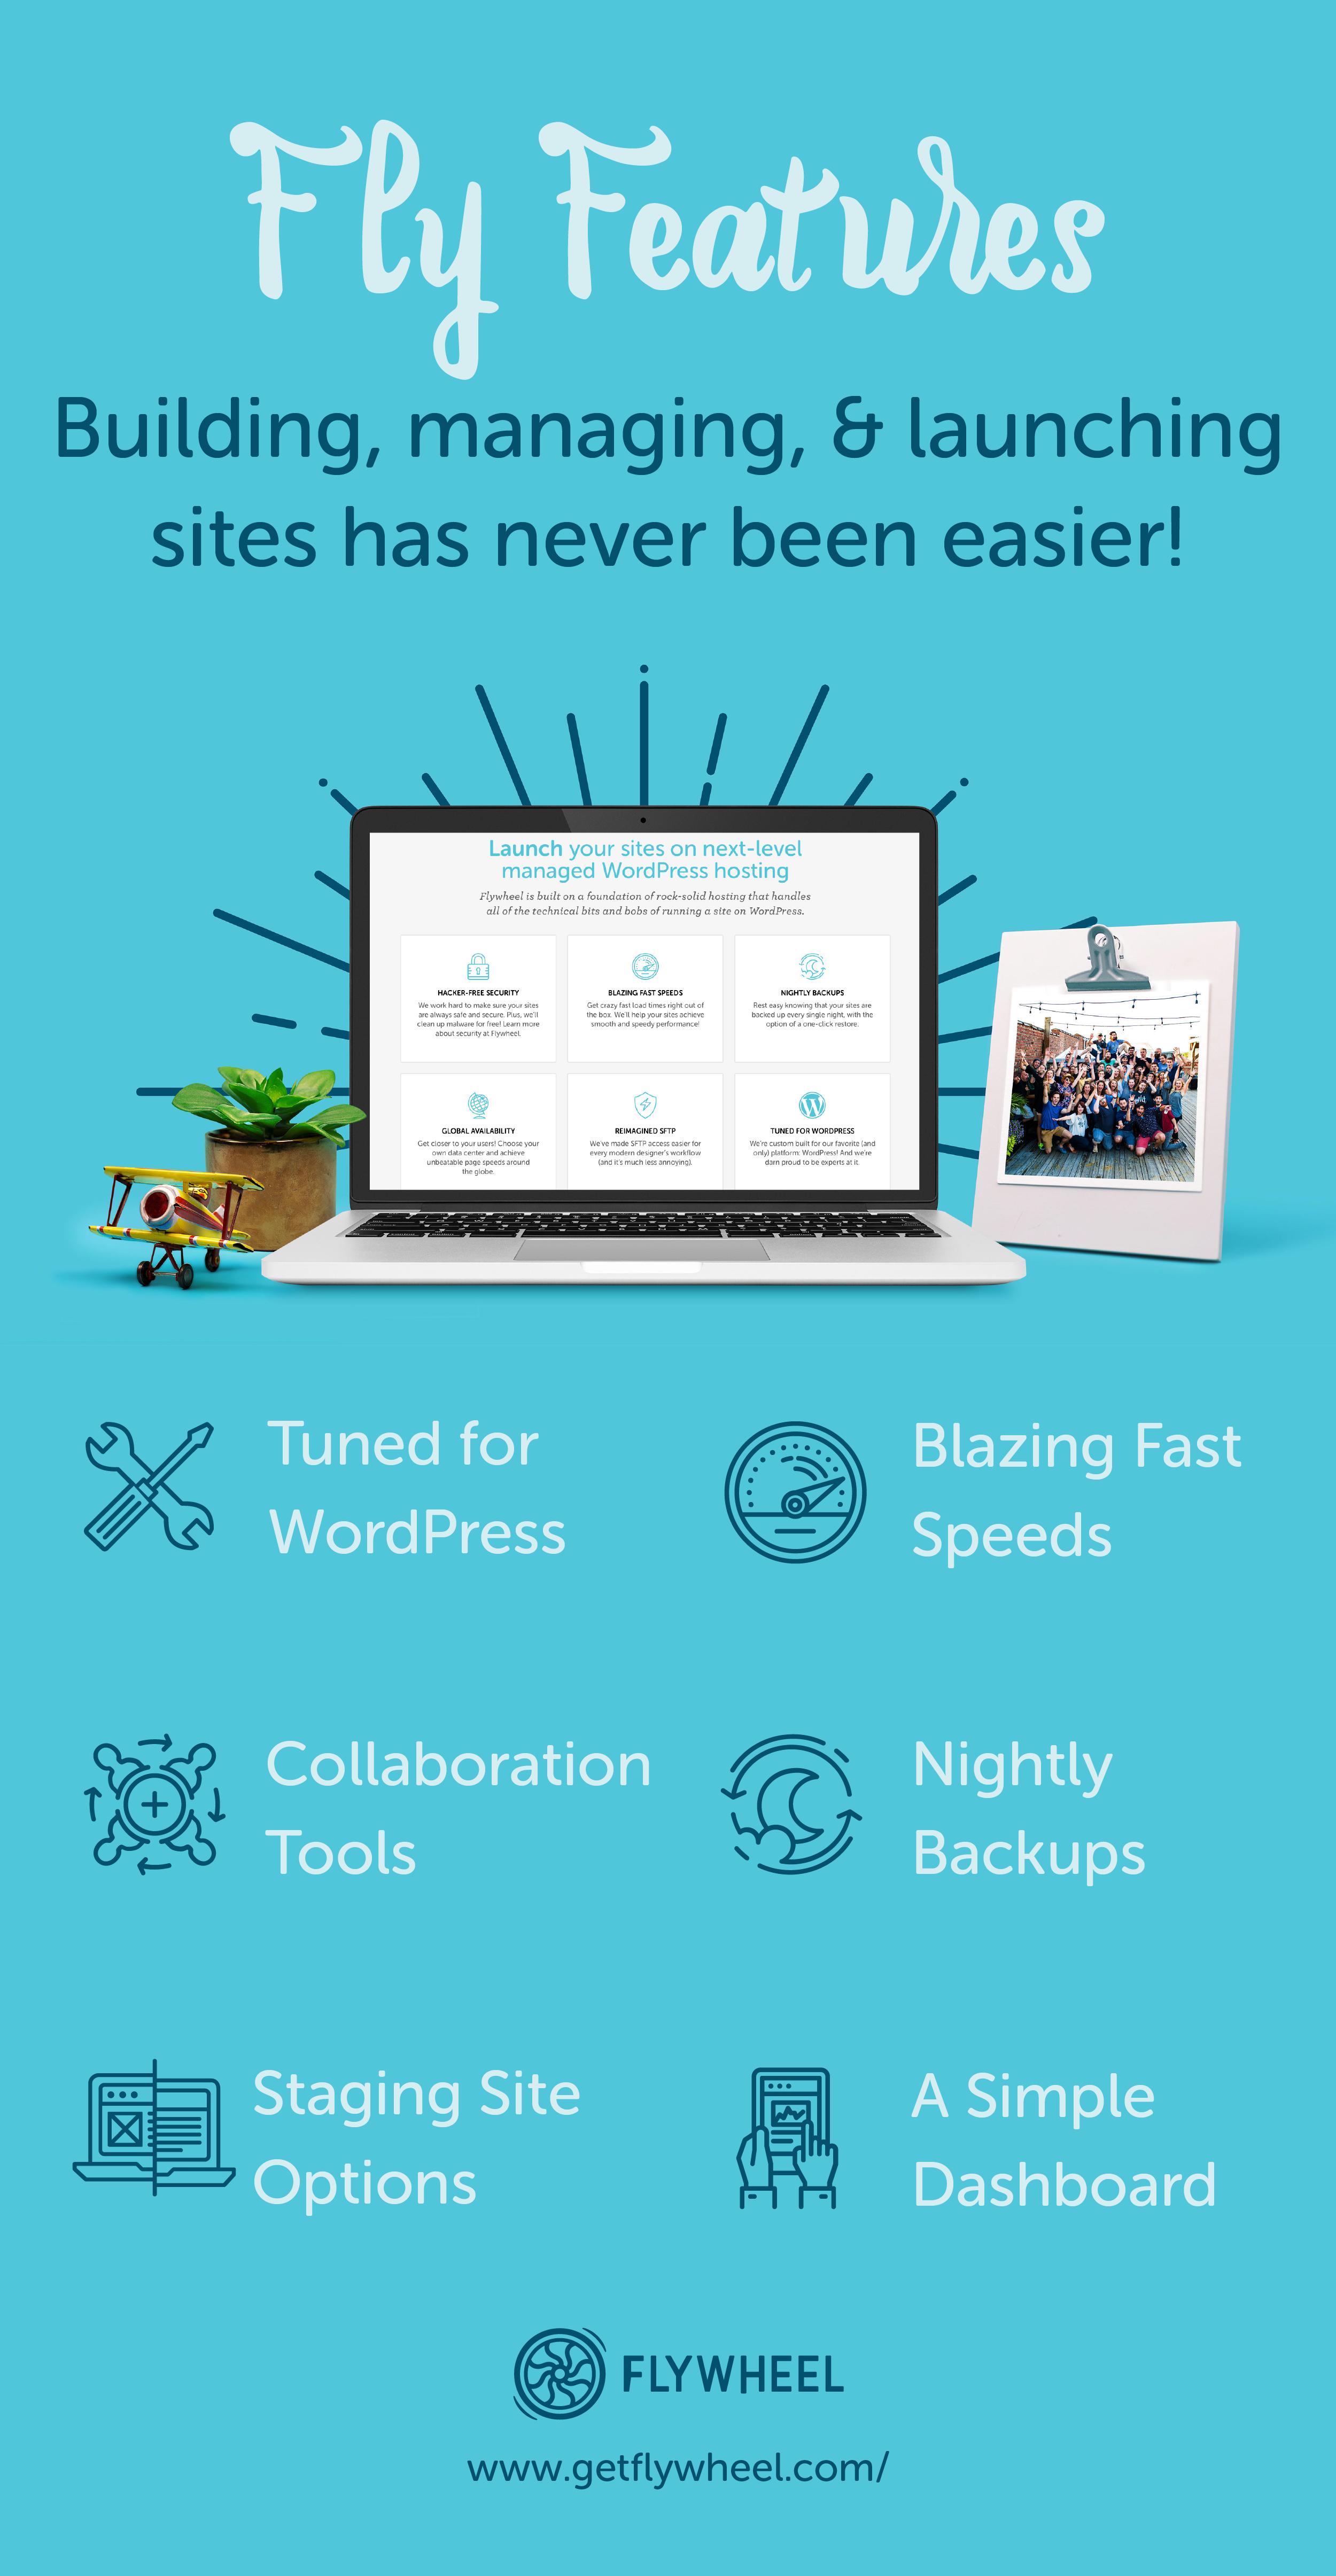 Build, Launch, Manage, Scale! Flywheel's delightful platform offers